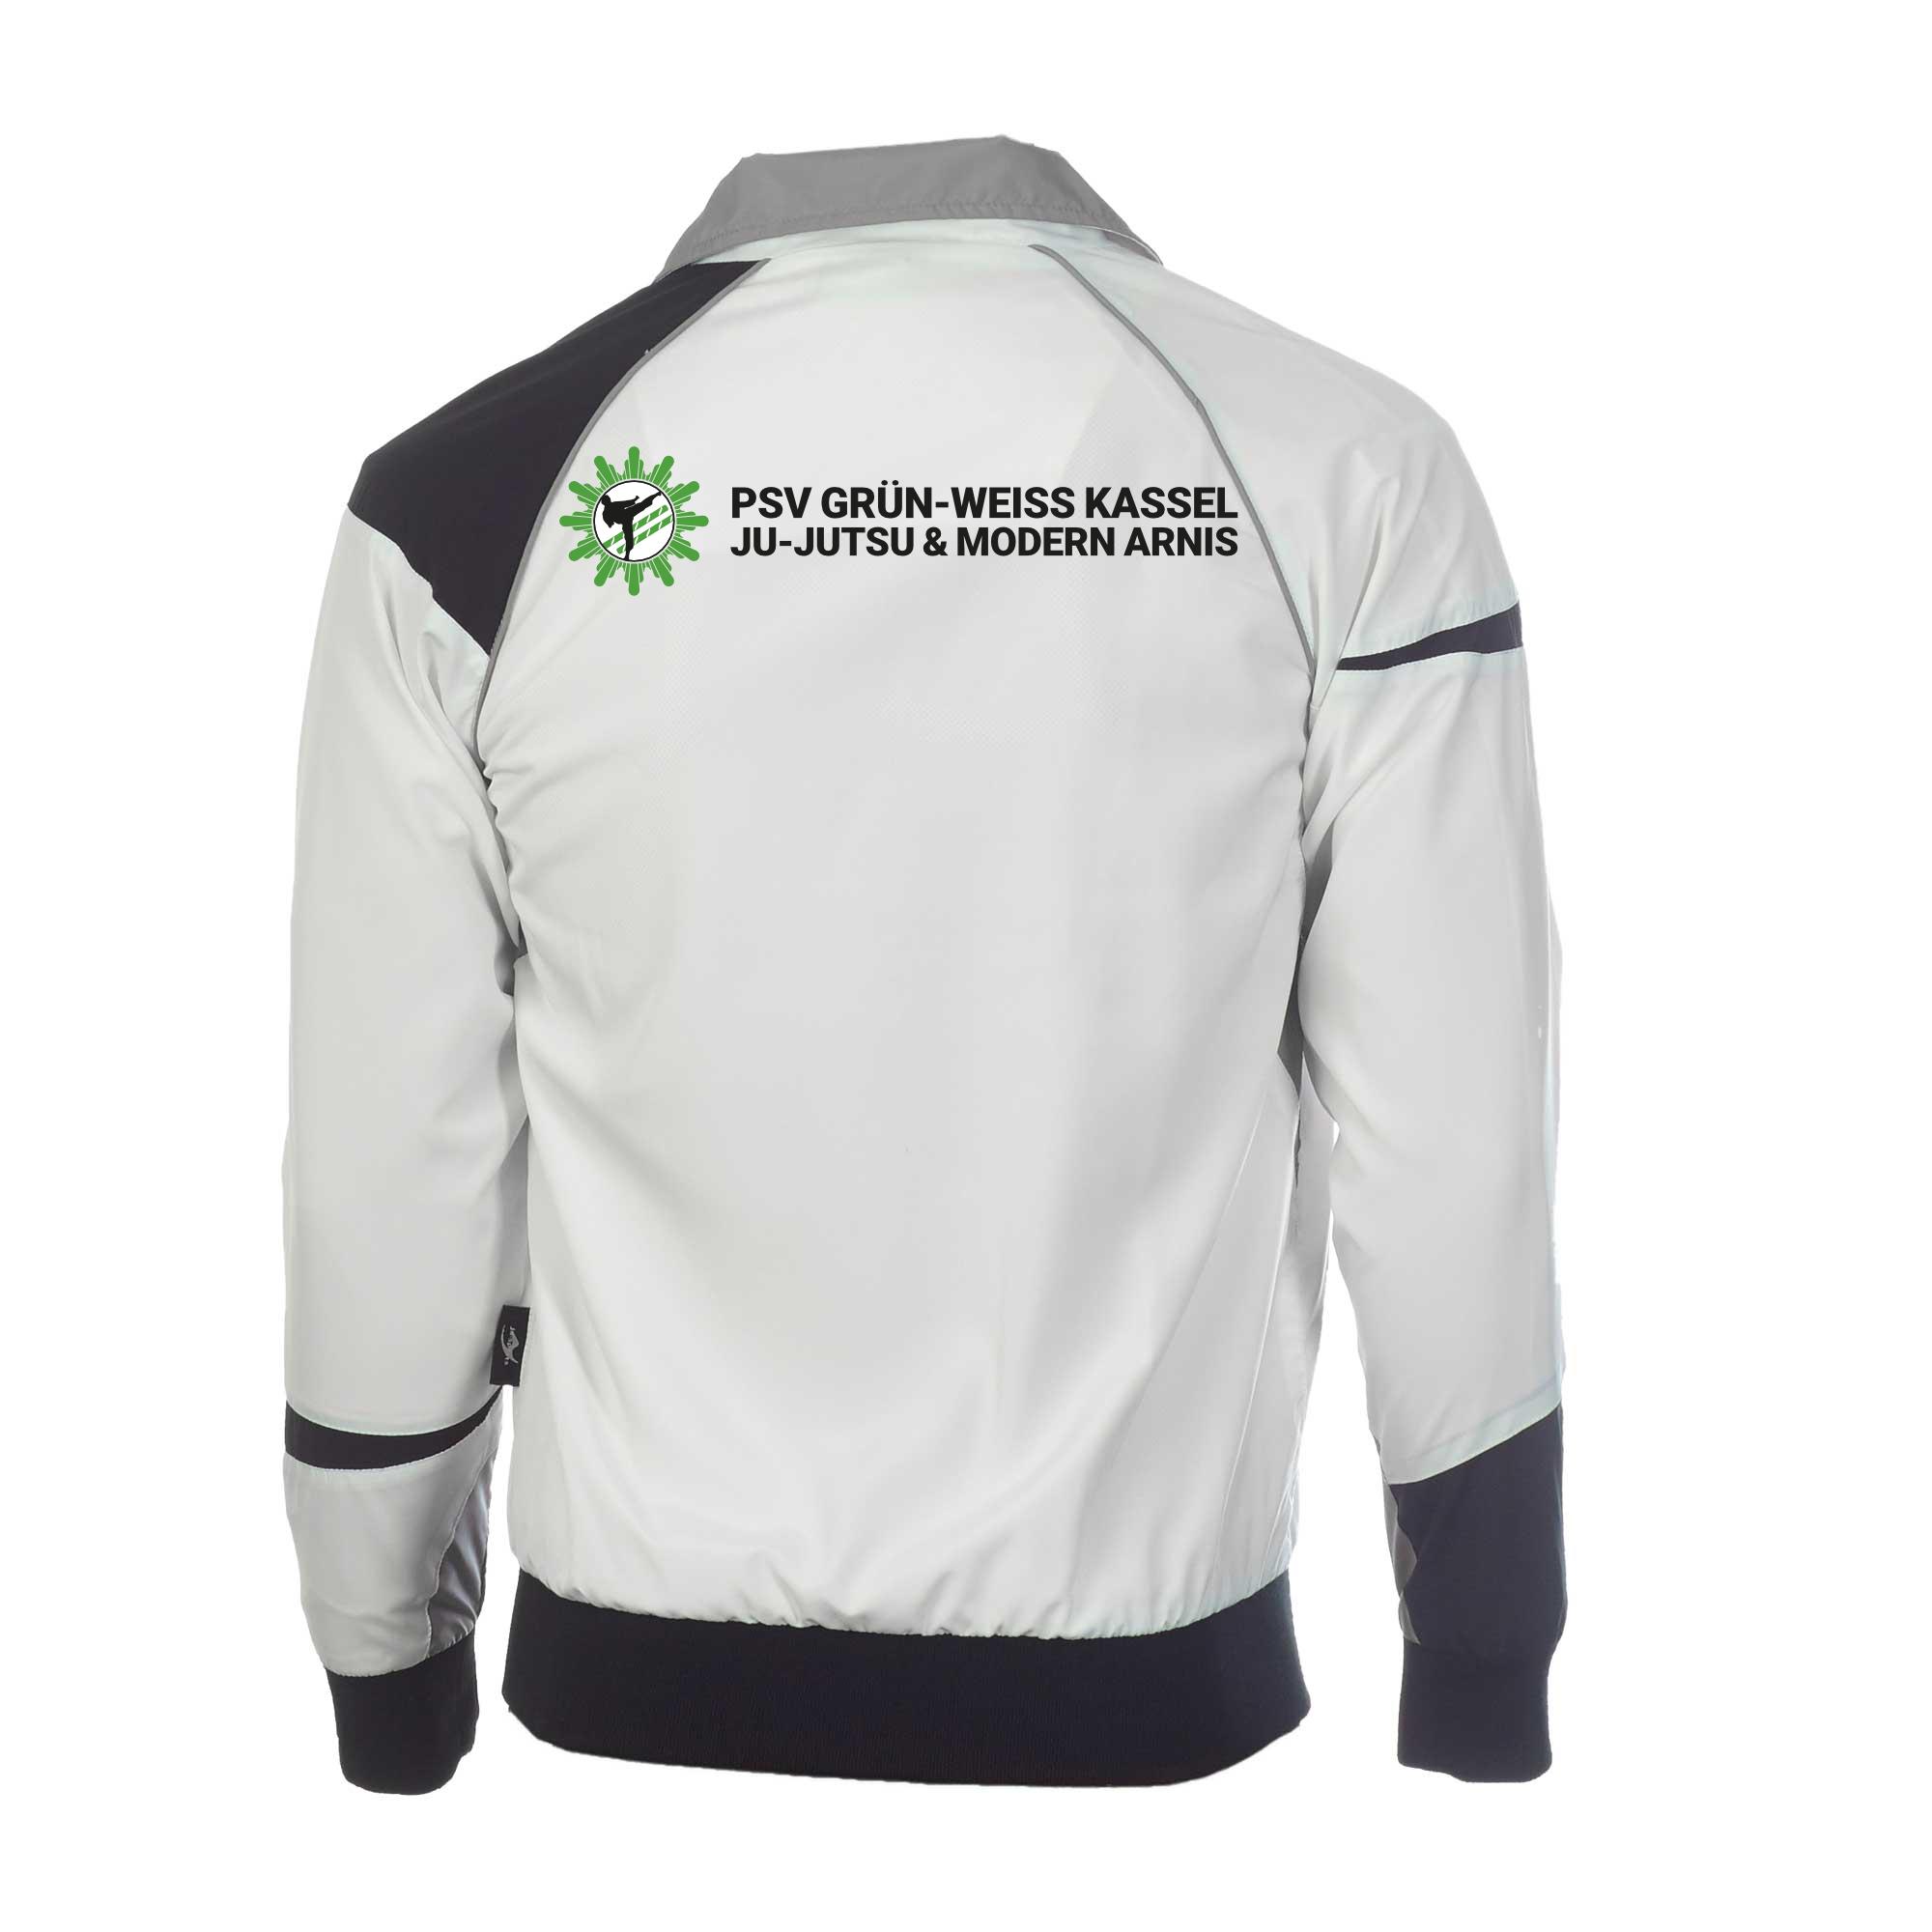 PSV Kassel Teamwear Element C1 Jacke weiß